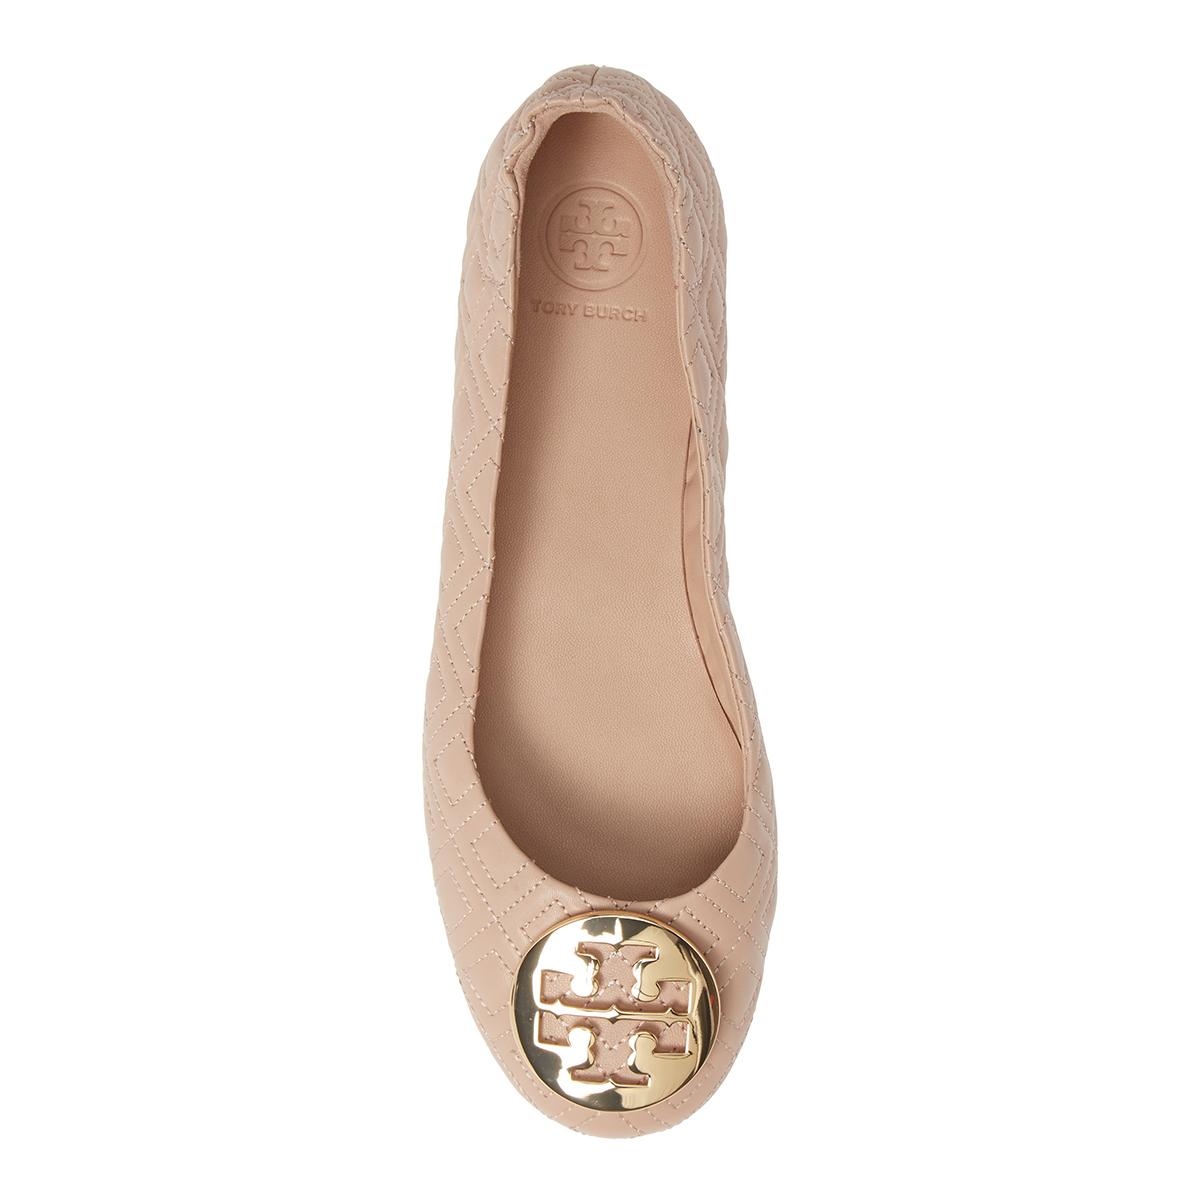 Tory Burch 'Minnie' Ballet Flat